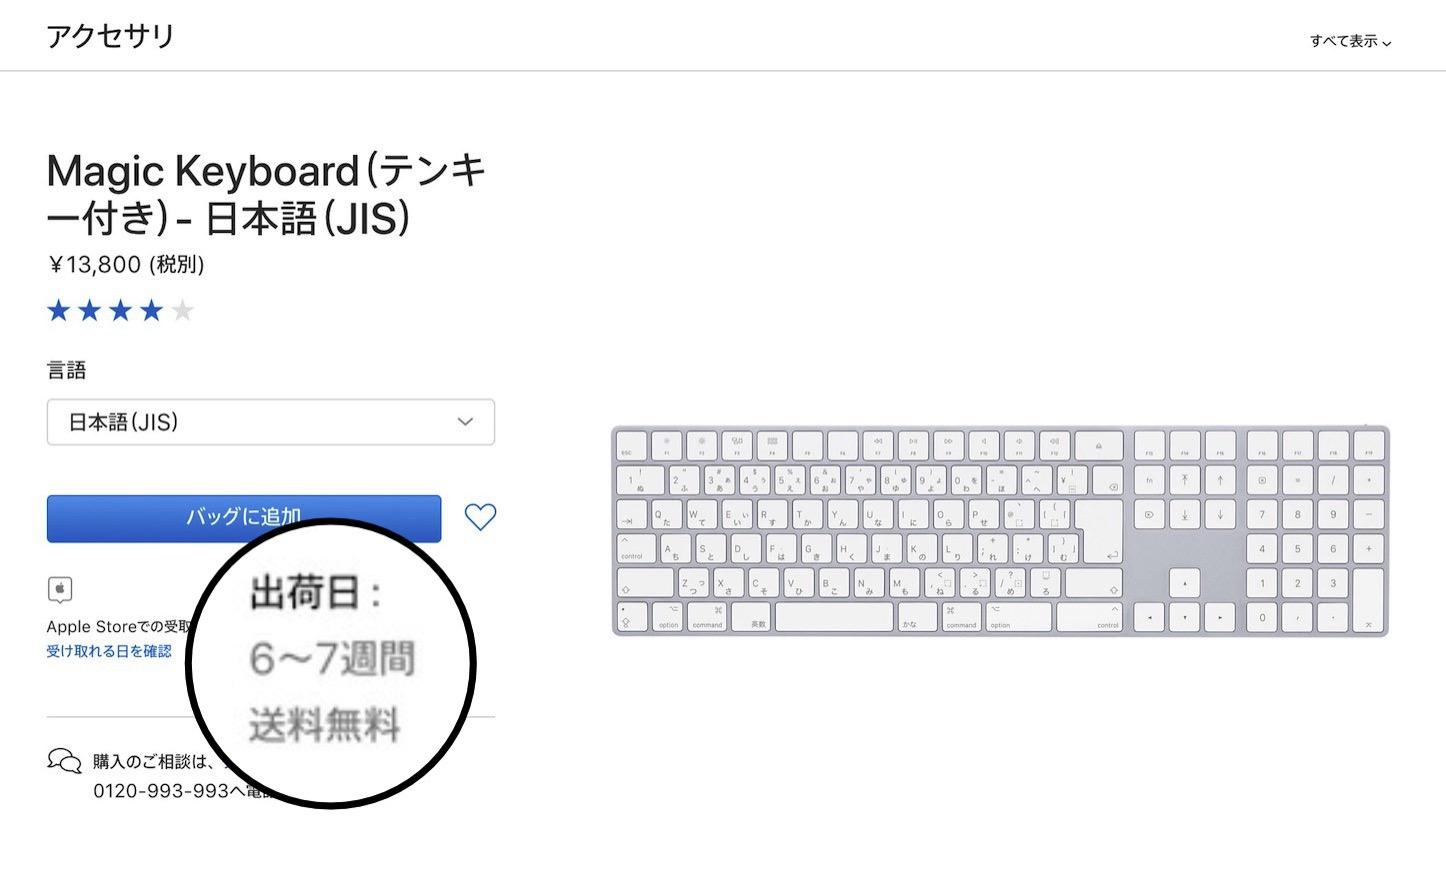 Magic Keyboard Release Date